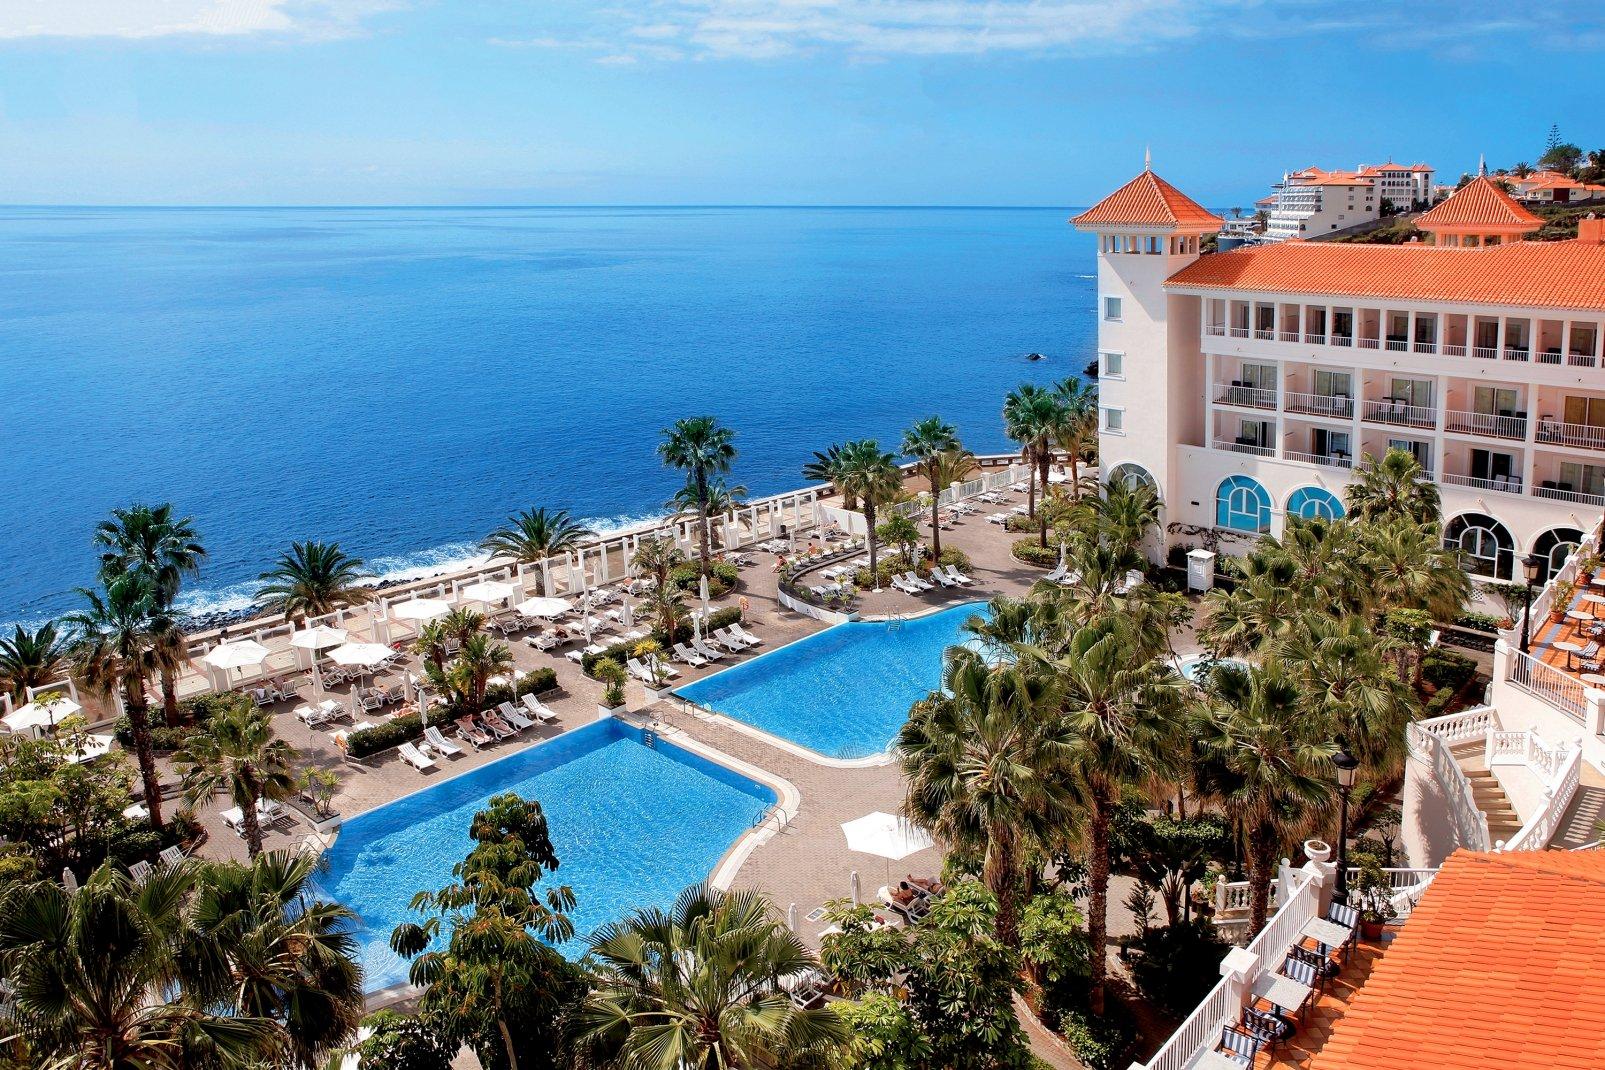 Hôtel Riu Palace Madeira 4* - 1